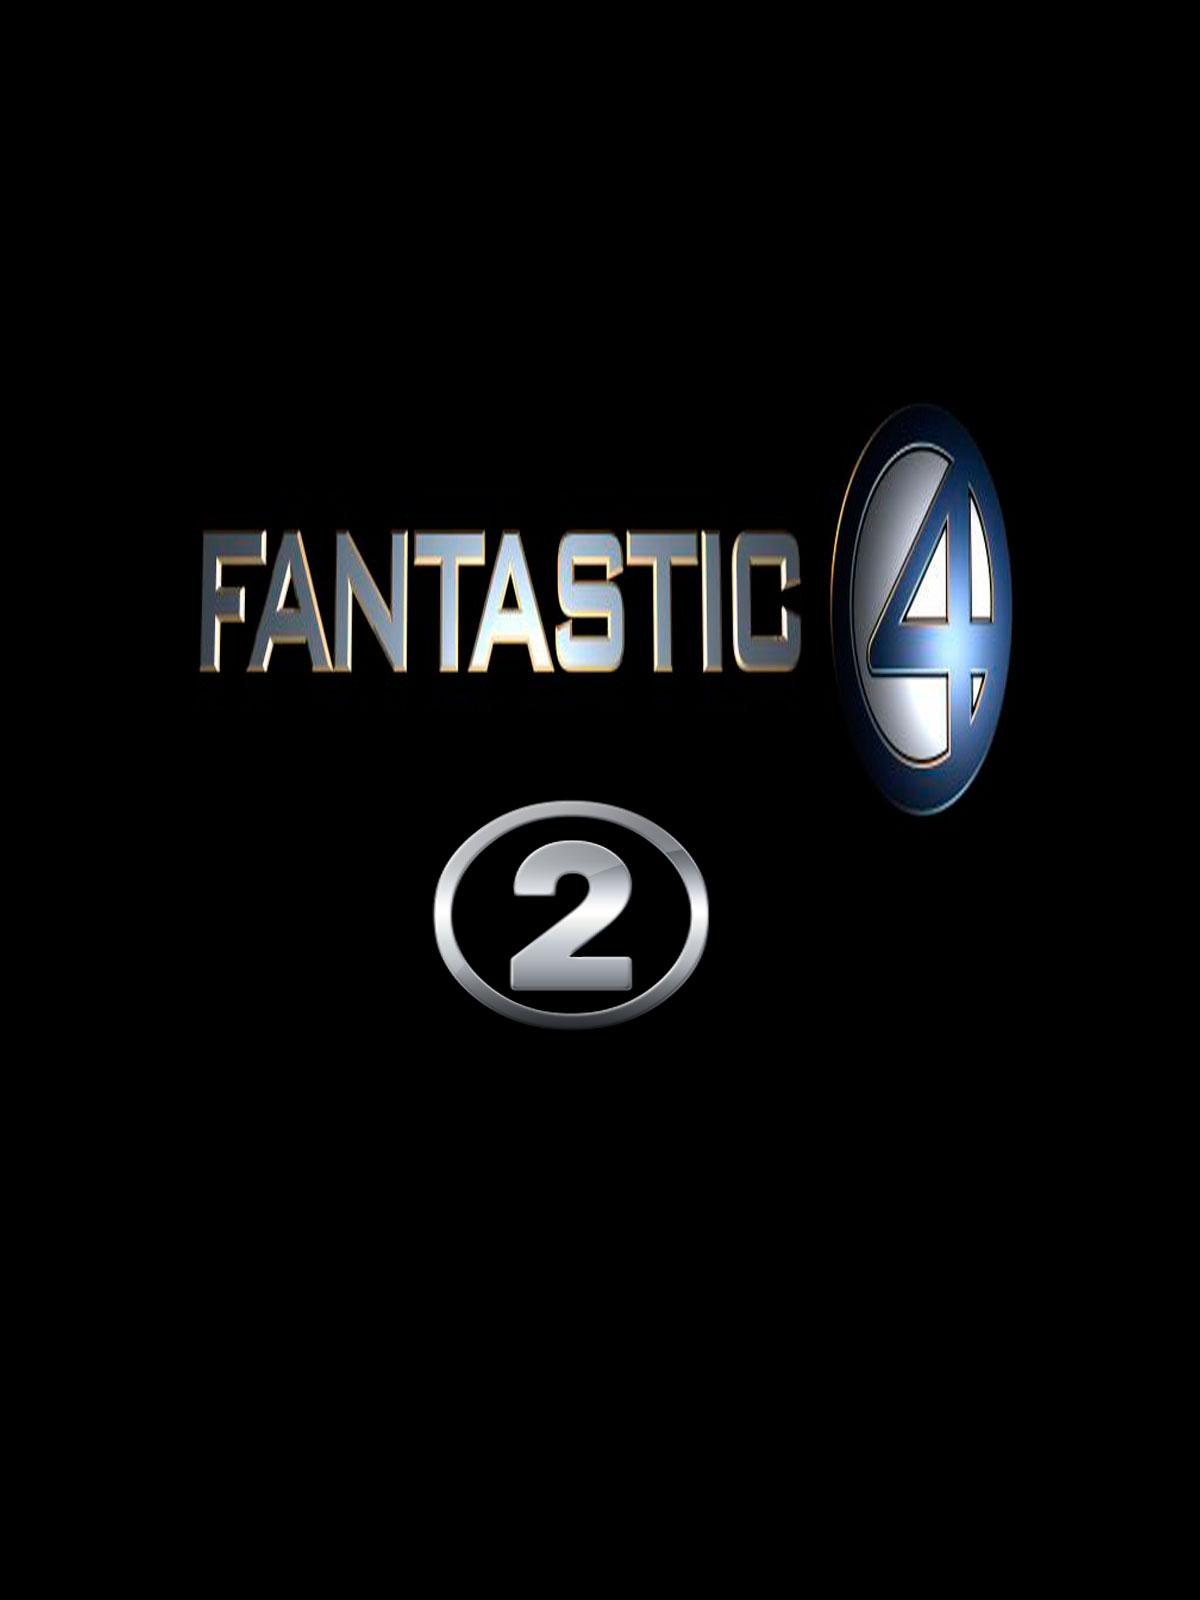 Fantastic Four 2 - Film 2017 - FILMSTARTS.de